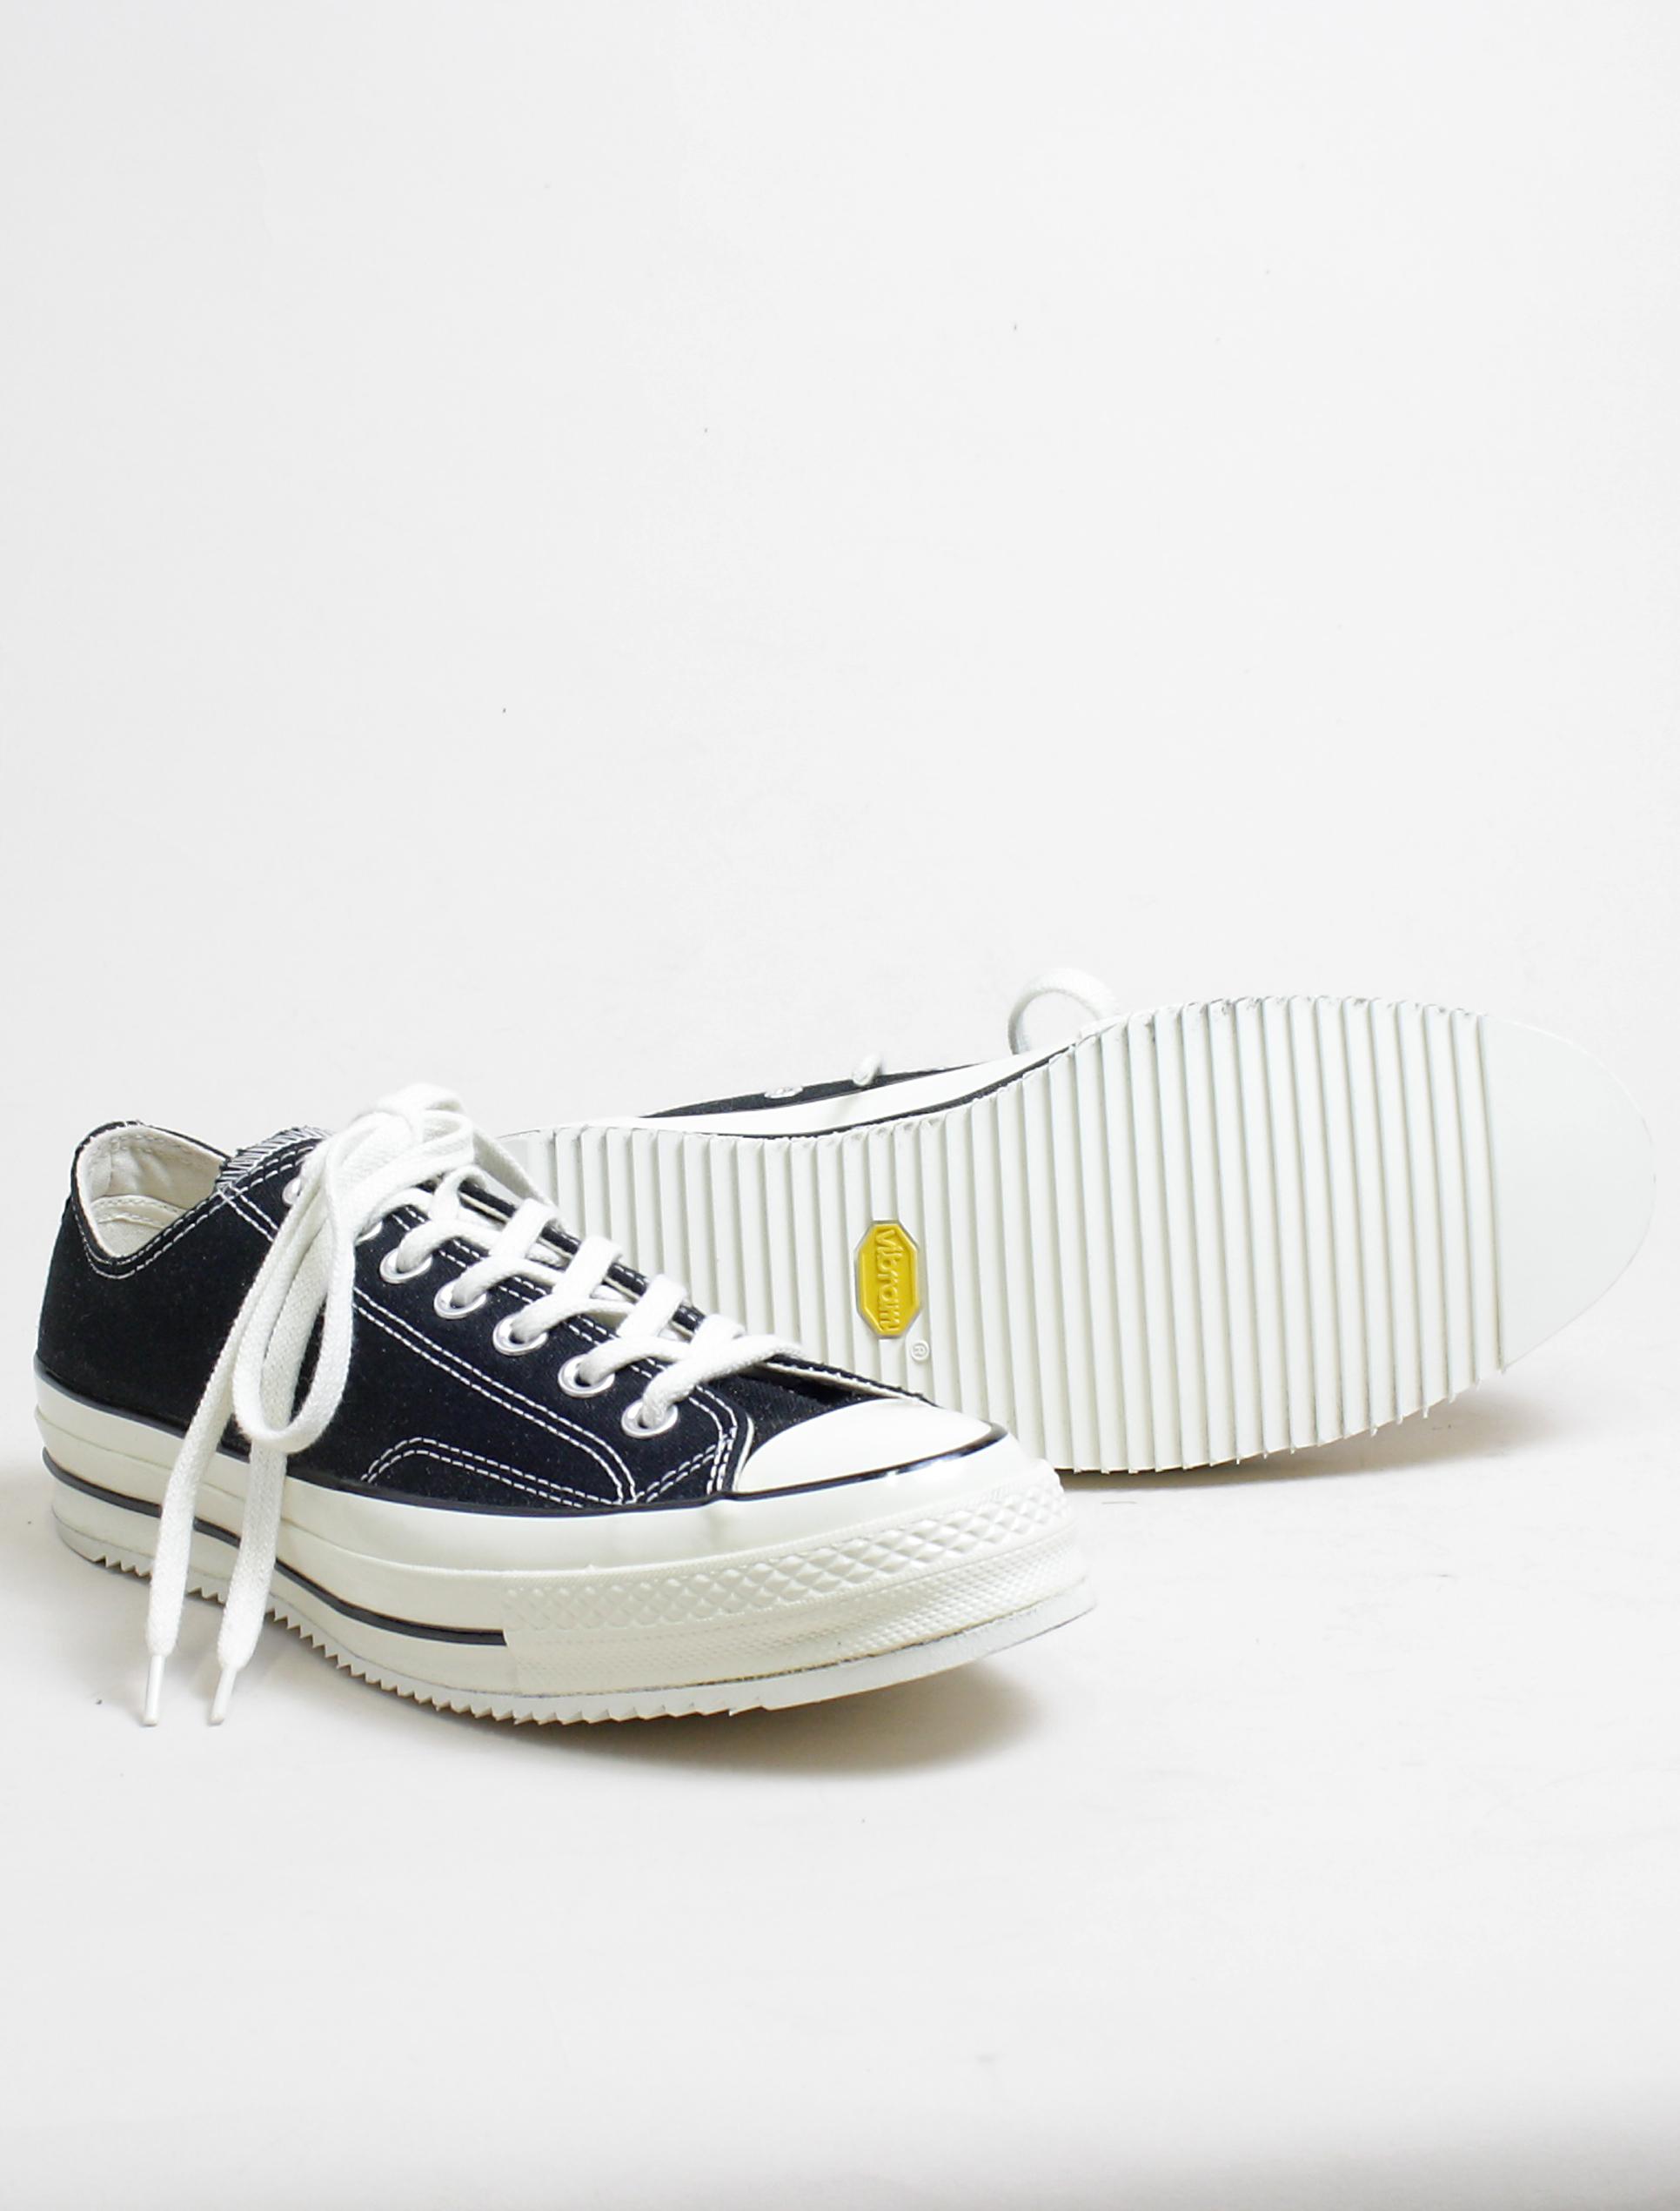 custom converse low